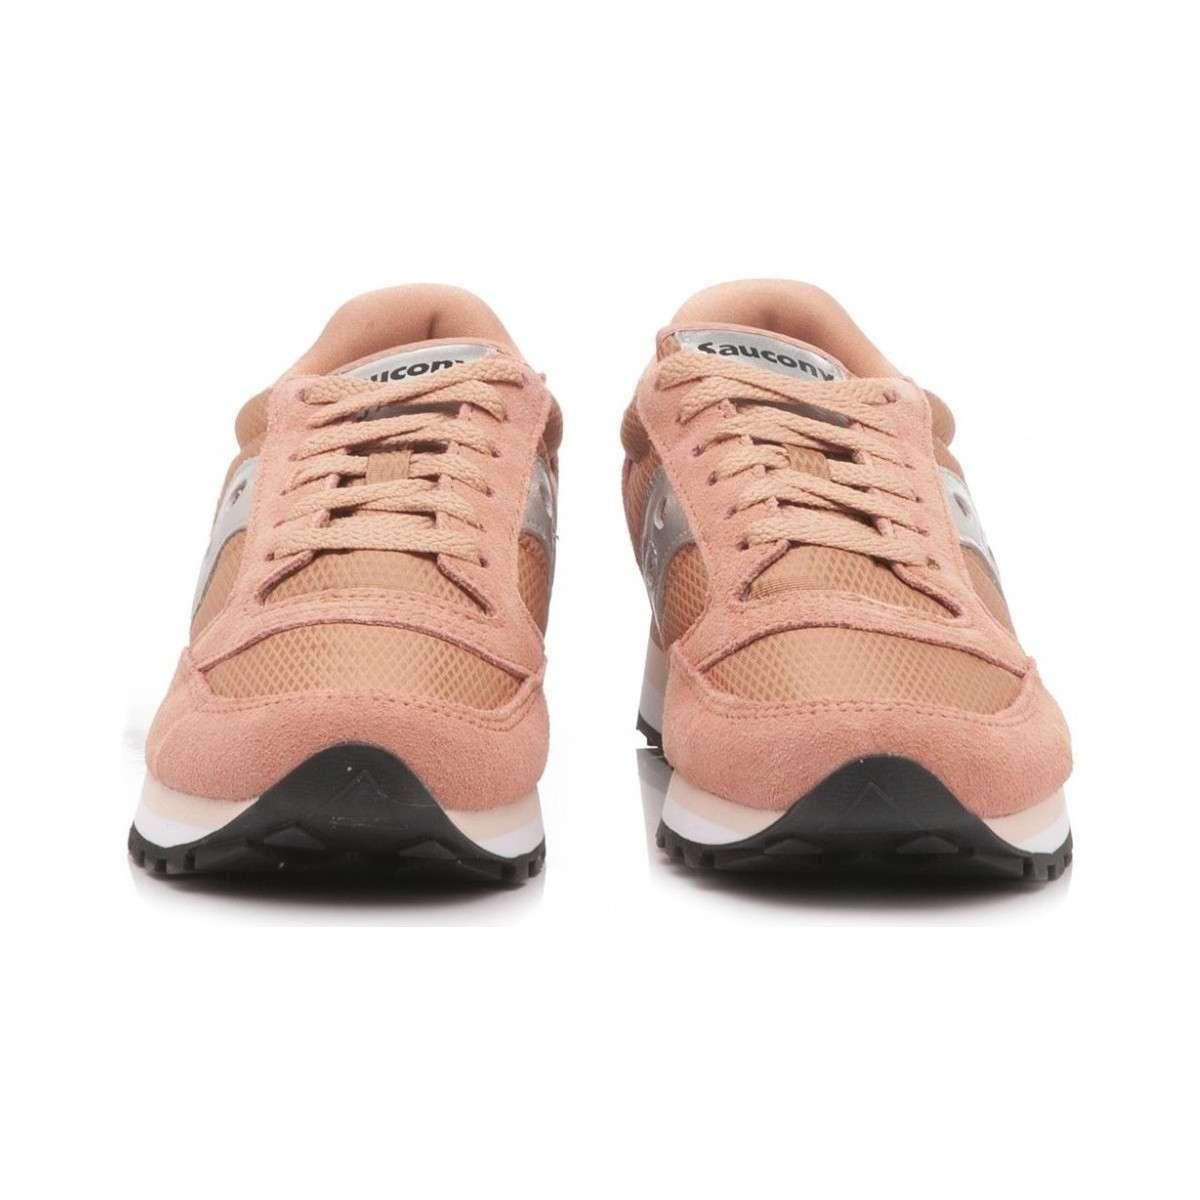 https://www.parmax.com/media/catalog/product/a/i/AI-Outlet_Parmax-Sneackers-Saucony-S60449-1-C.jpg